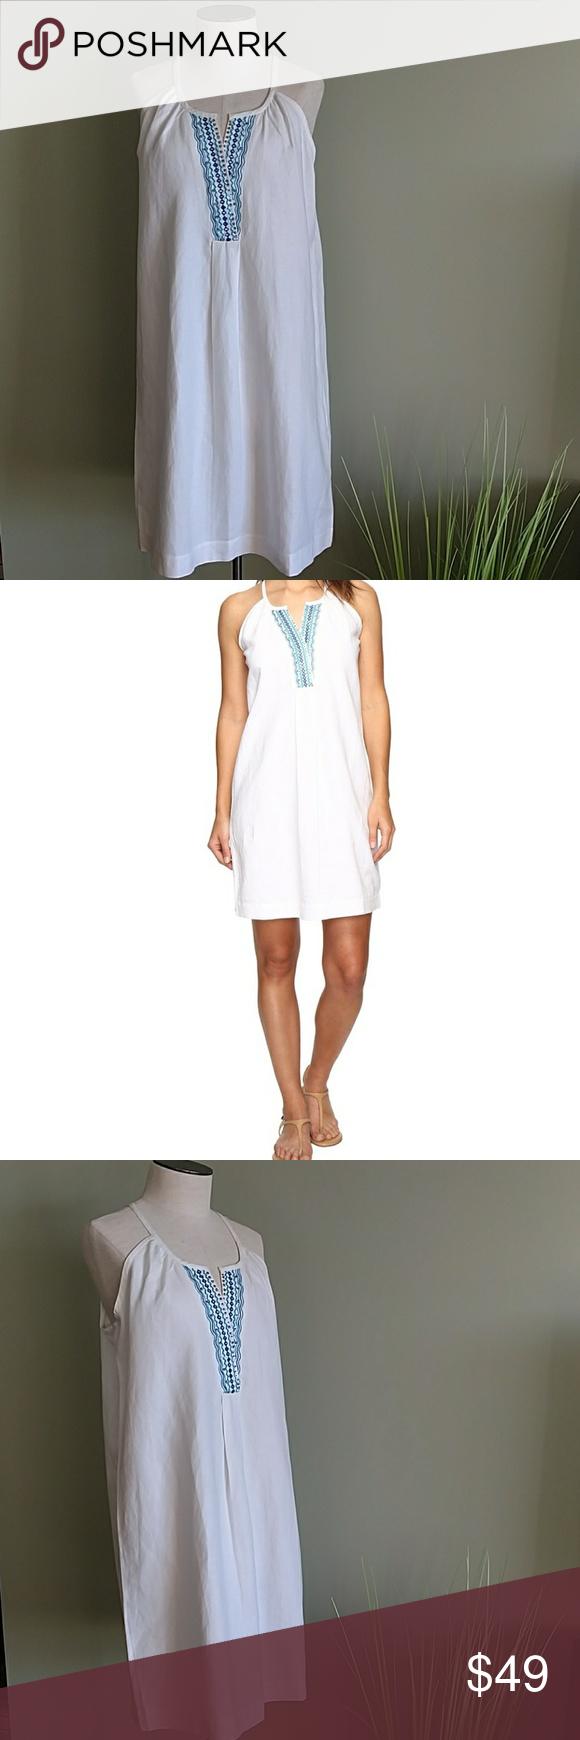 1f0ab744e5e Tommy Bahama Embellished Linen Shift Dress FaBuLoUs embroidery along the  collar! Shift style